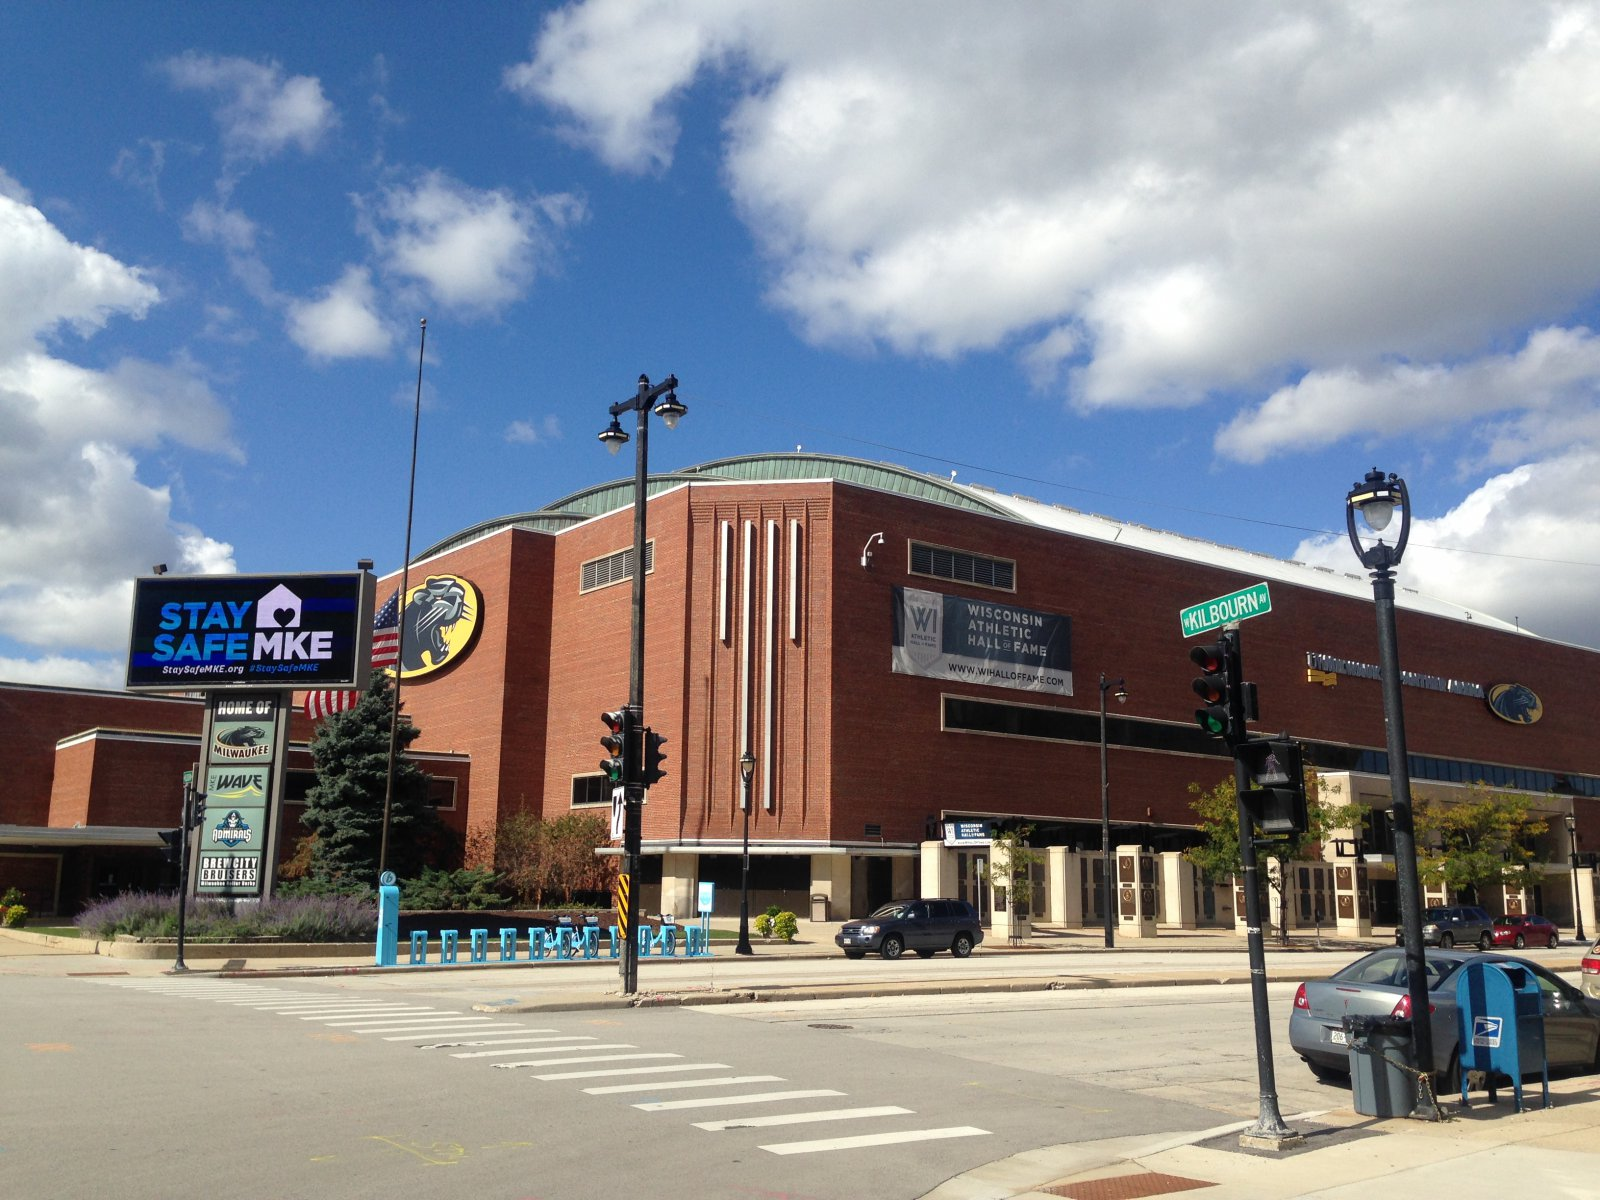 UW Milwaukee Panther Arena, 400 W. Kilbourn Ave